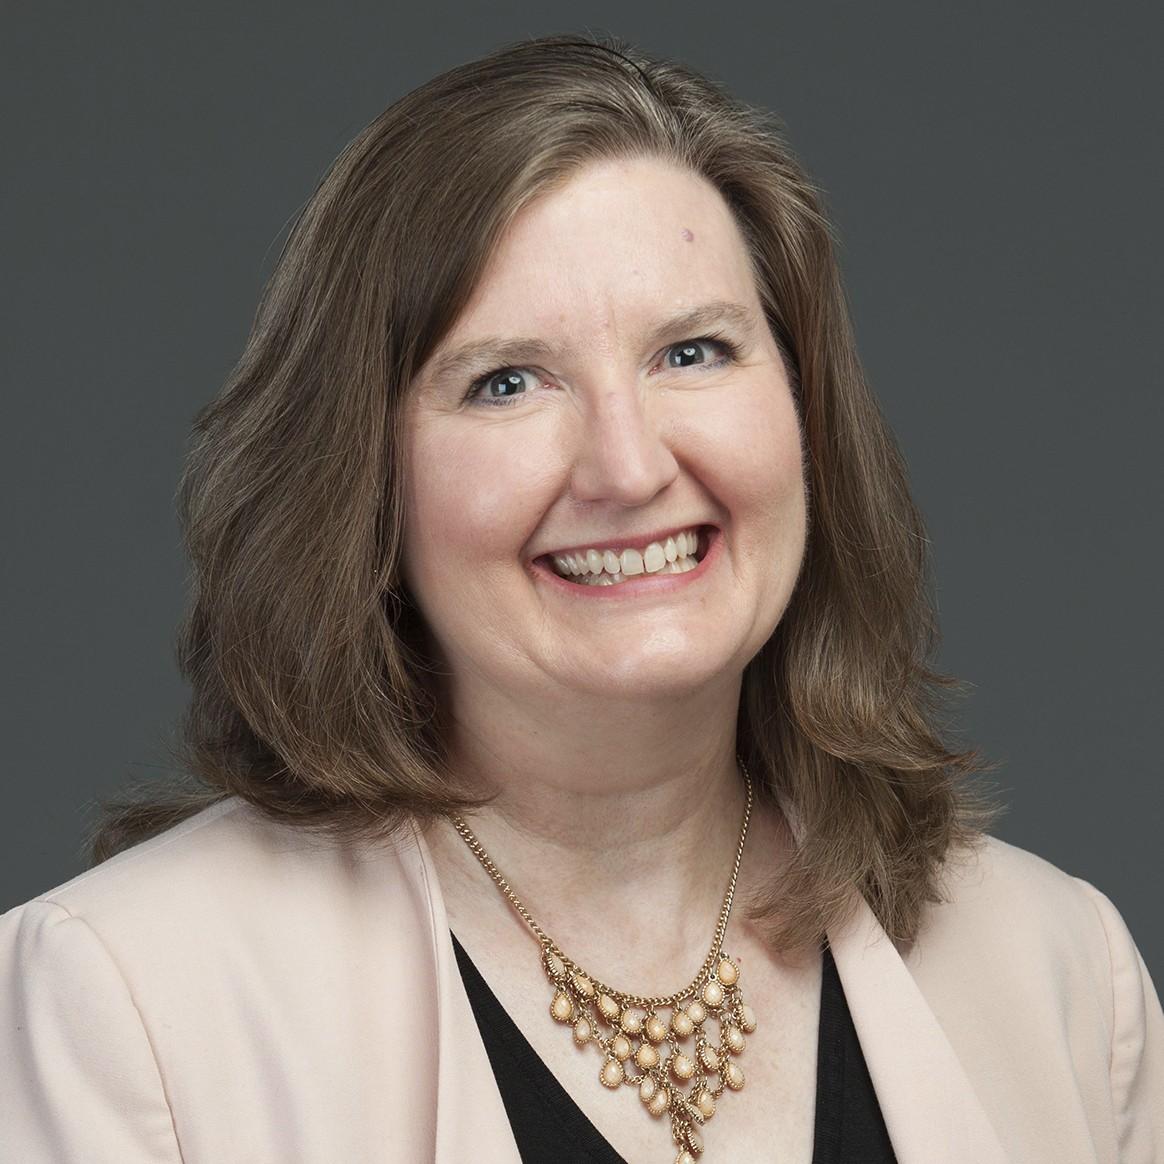 Headshot of Penn State Music Education Professor Linda Thornton